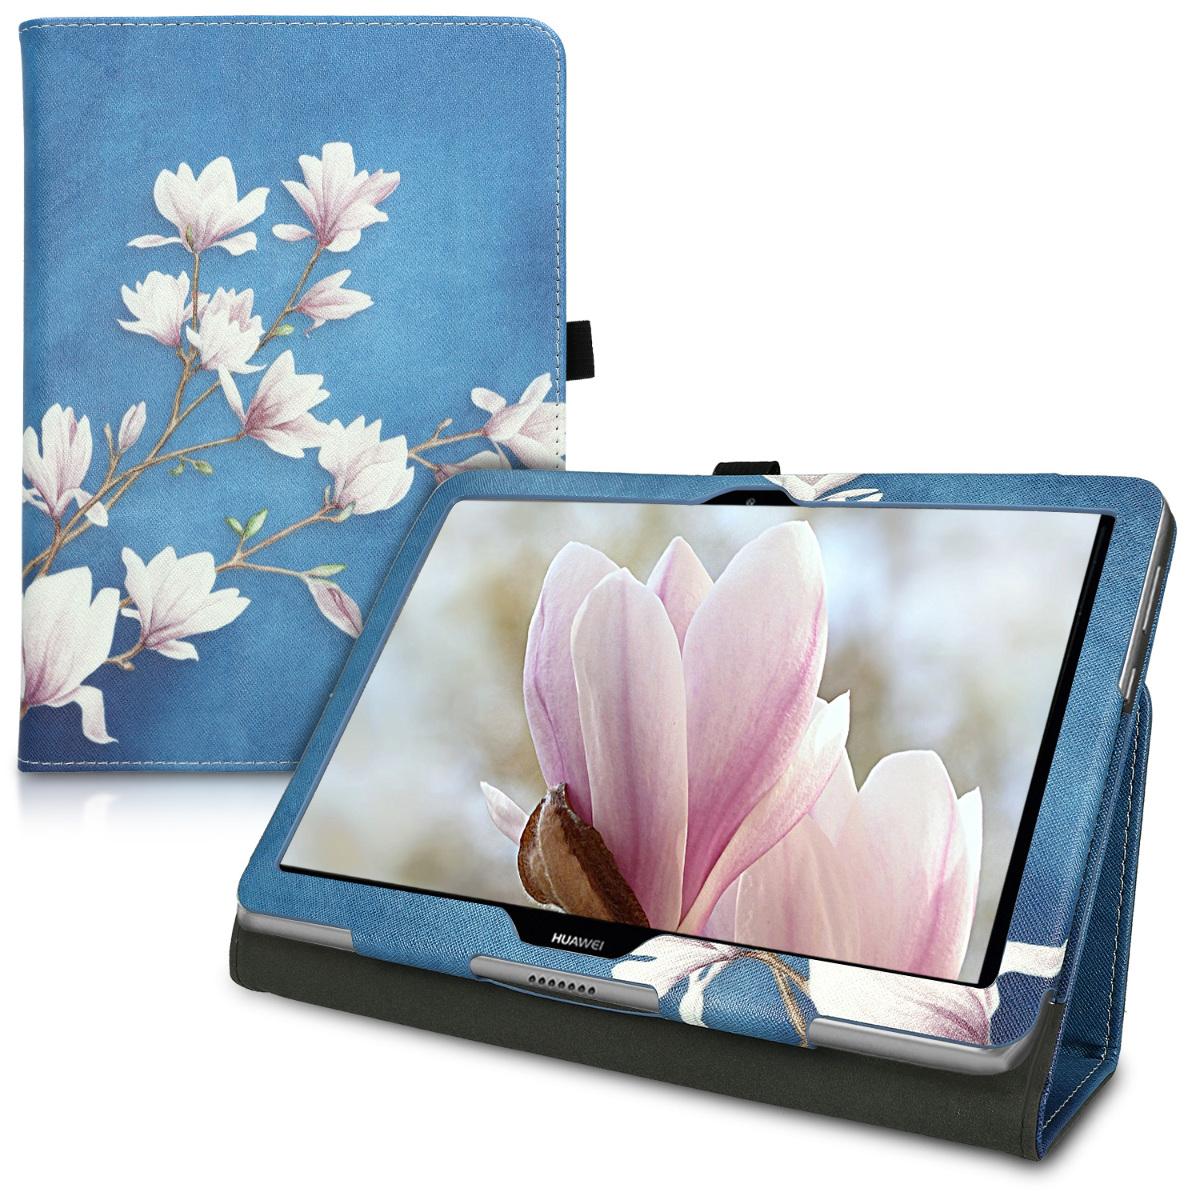 KW Θήκη Slim Huawei MediaPad T3 10'' - Σχέδιο λουλούδια (42651.07)